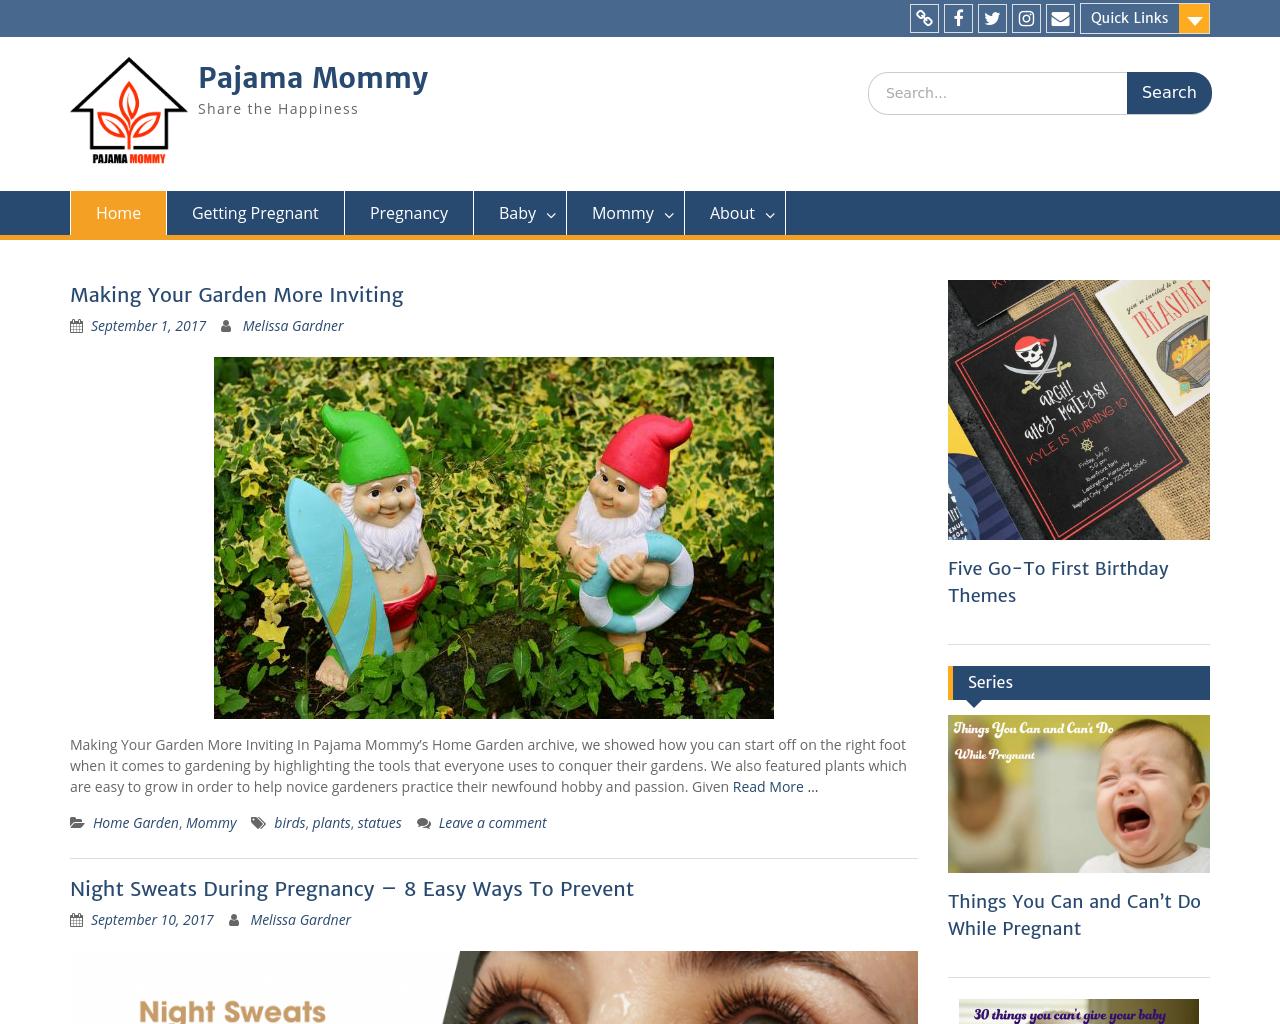 Pajama-Mommy-Advertising-Reviews-Pricing